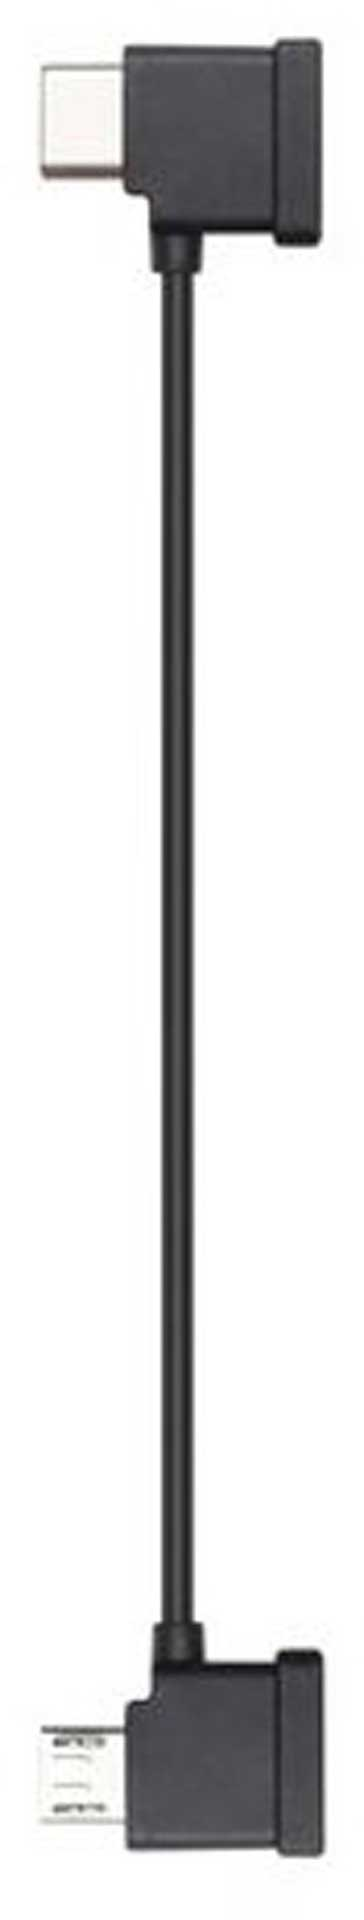 DJI MAVIC AIR 2 RC CABLE STANDARD MICRO-USB CONNECTOR